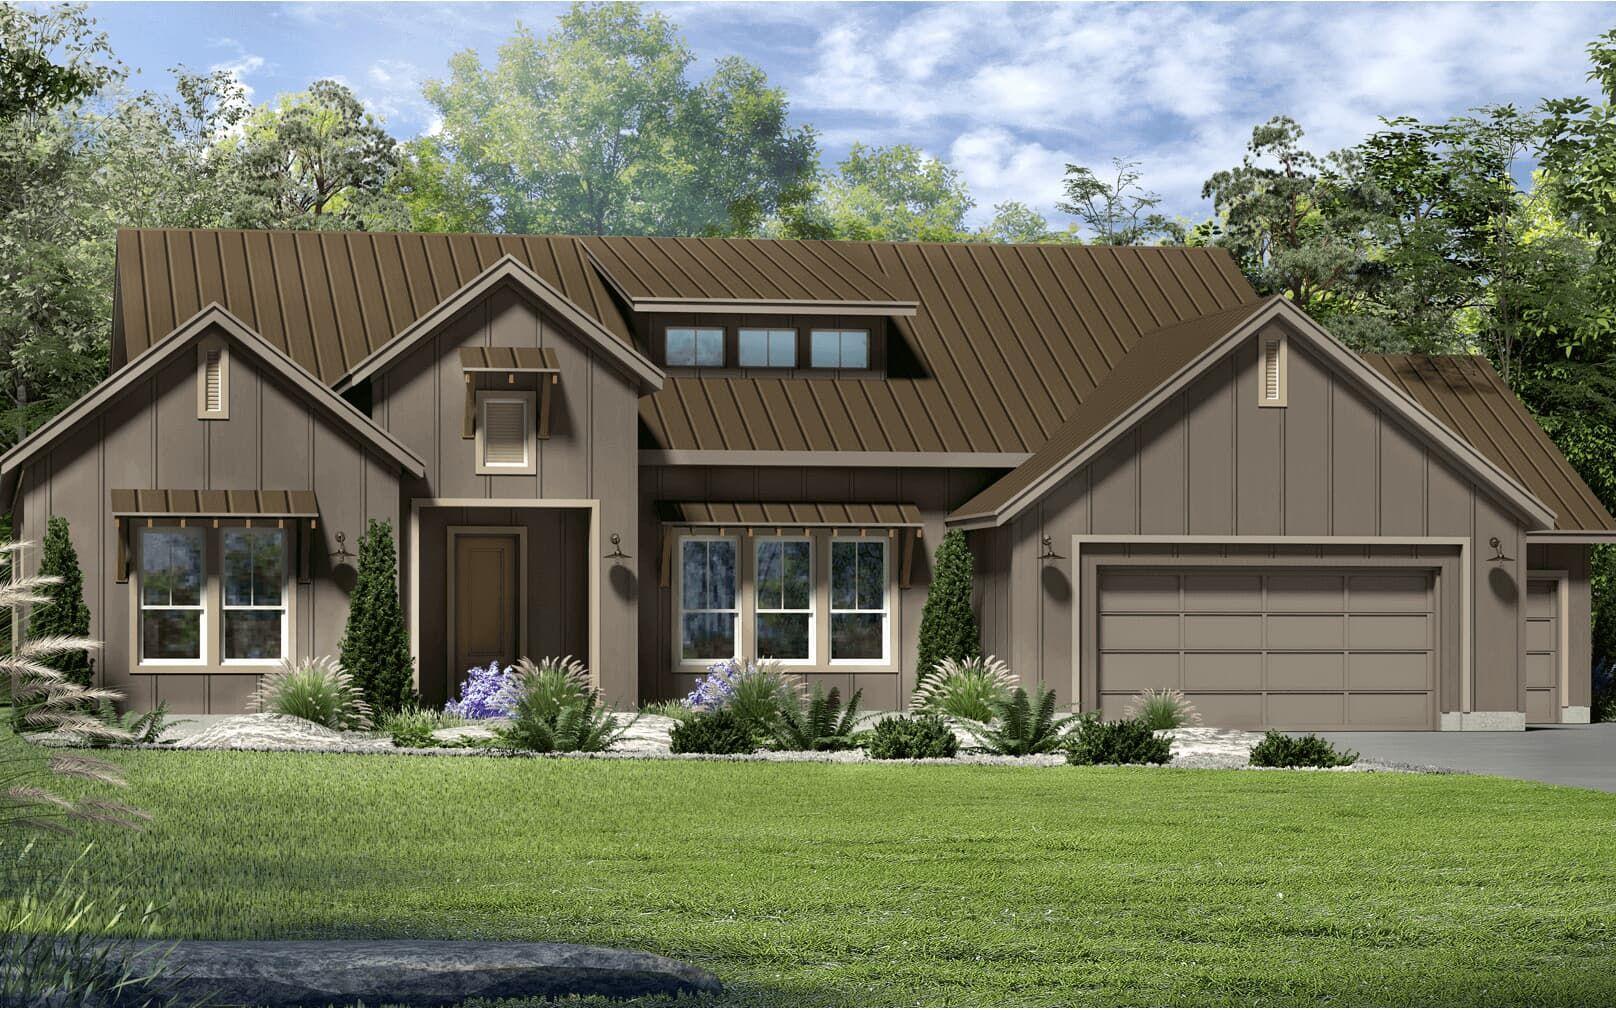 Exterior:floor plan pomona modern farmhouse kissing tree san marcos texas